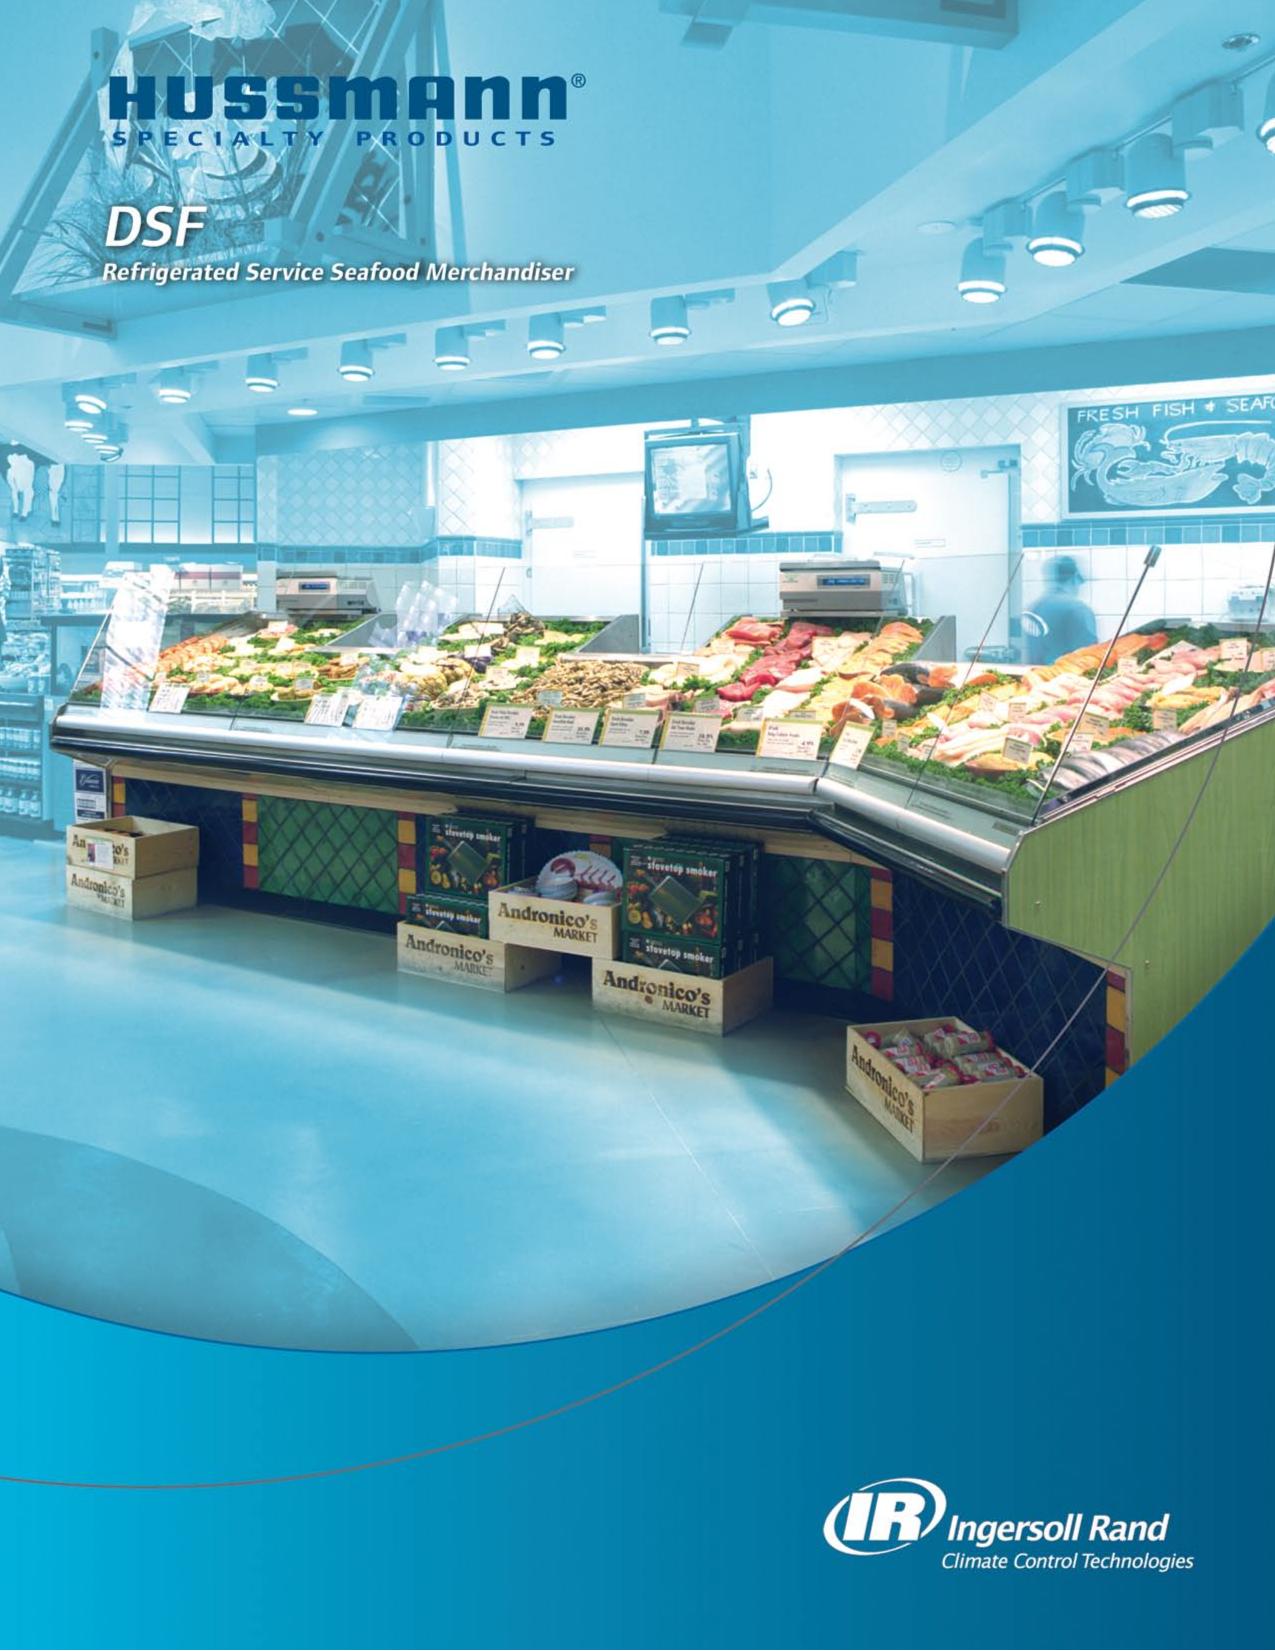 pdf for Hussmann Other DSFM Merchandisers manual